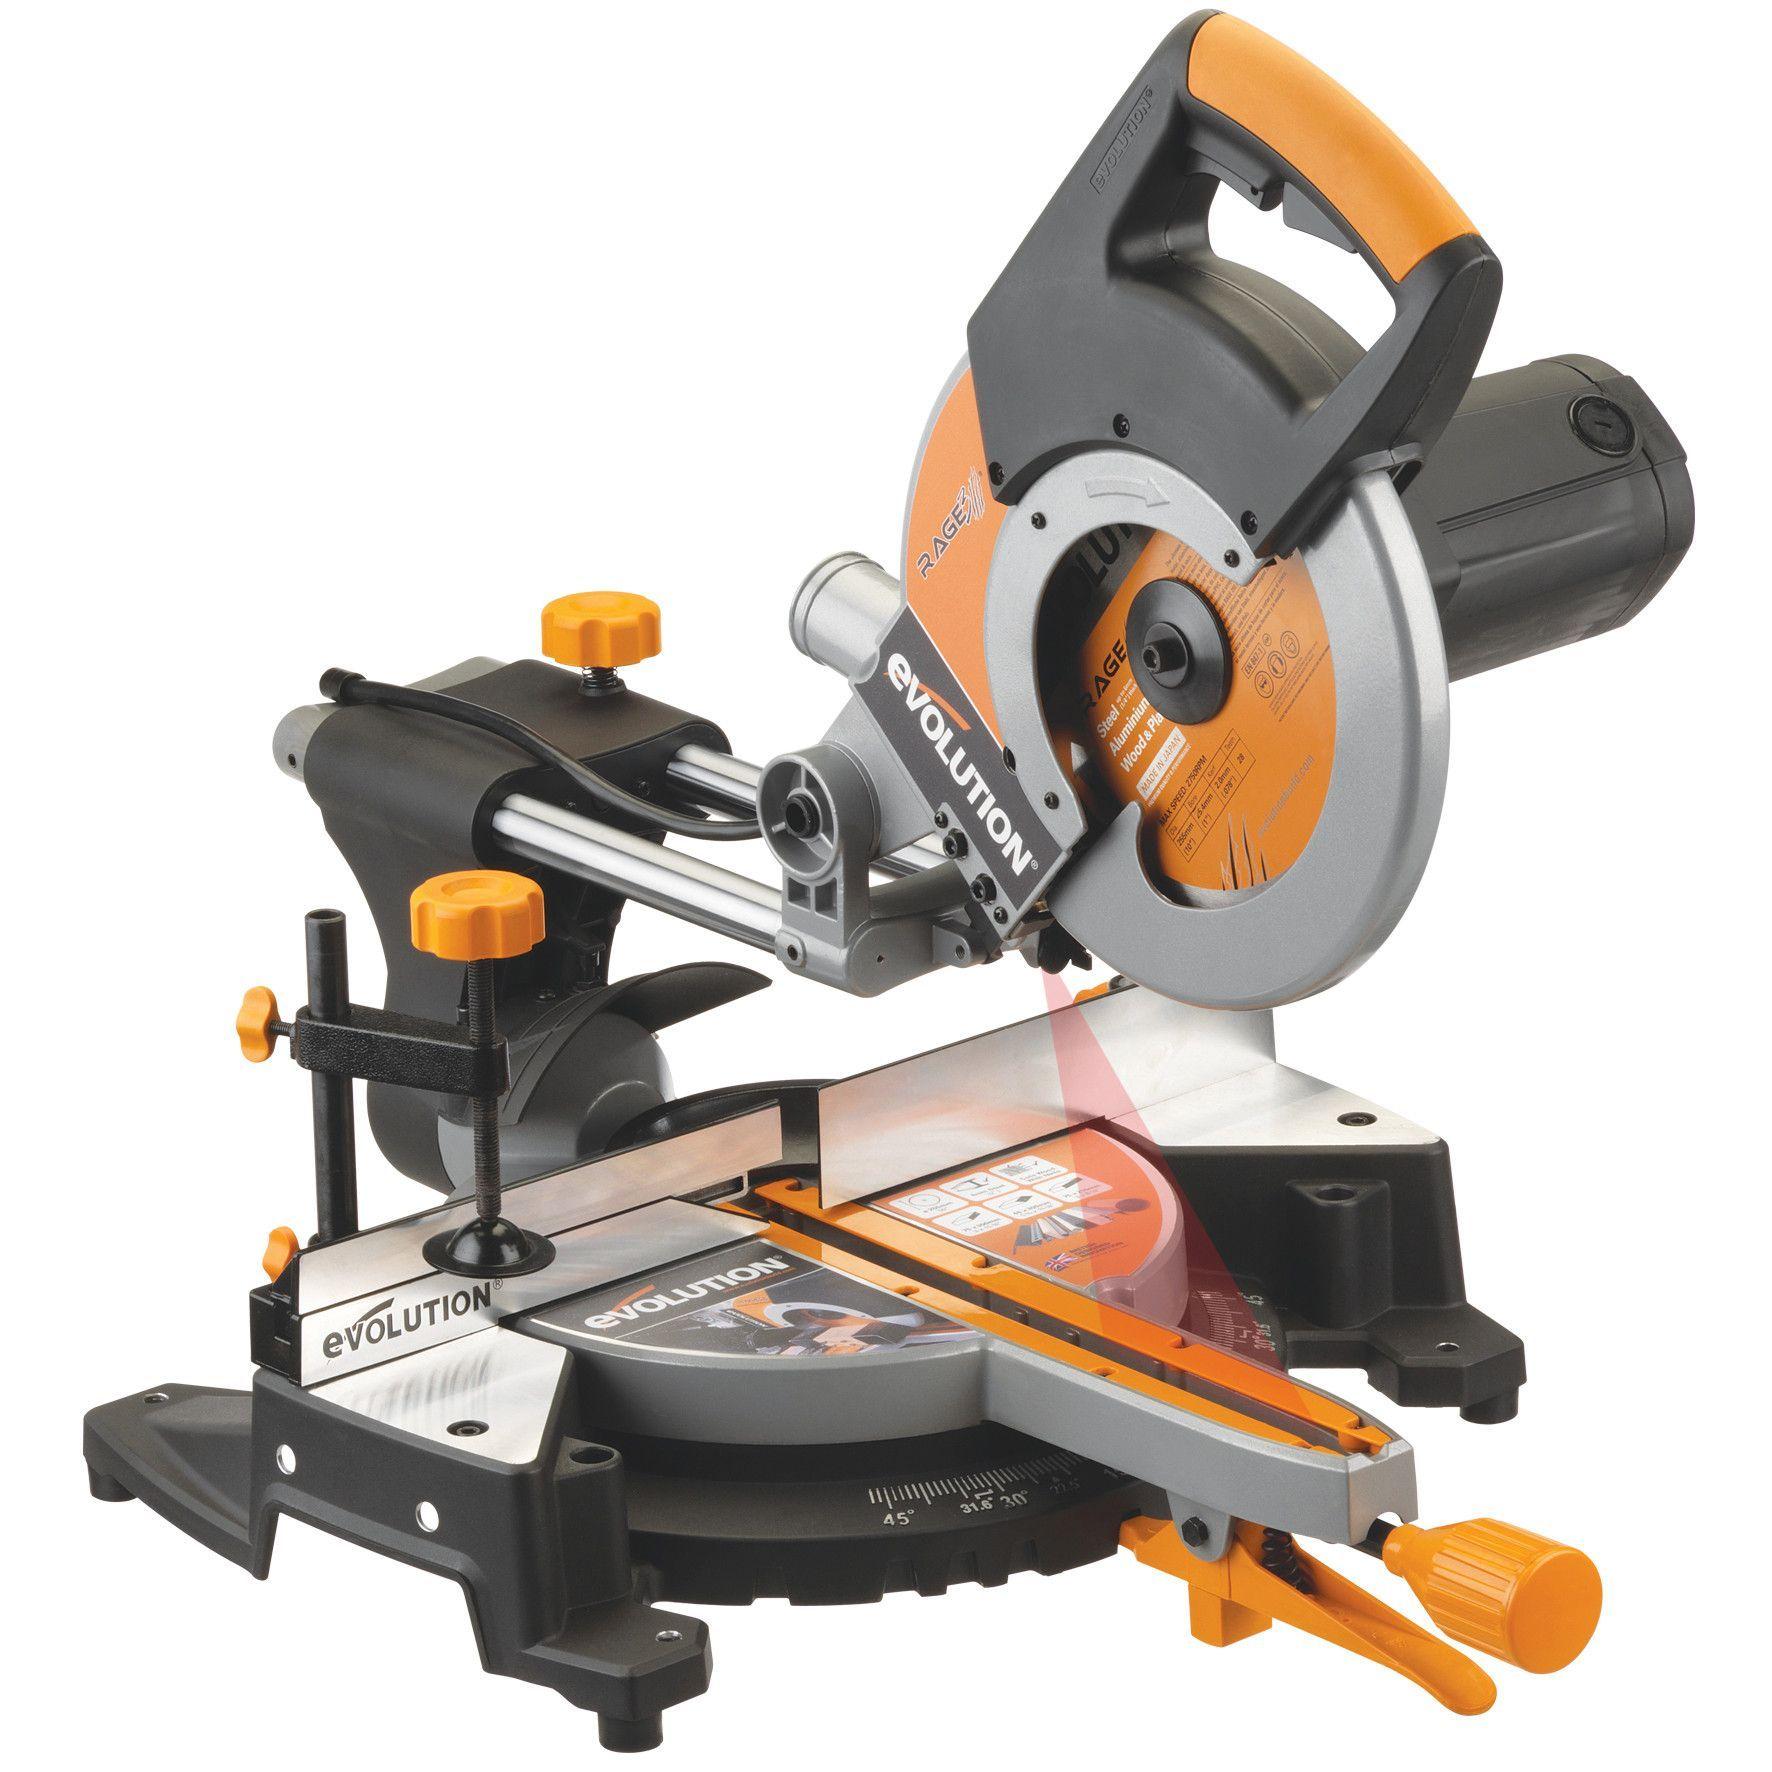 Evolution Power Tools Rage3fp 10 Wood Miter Saw